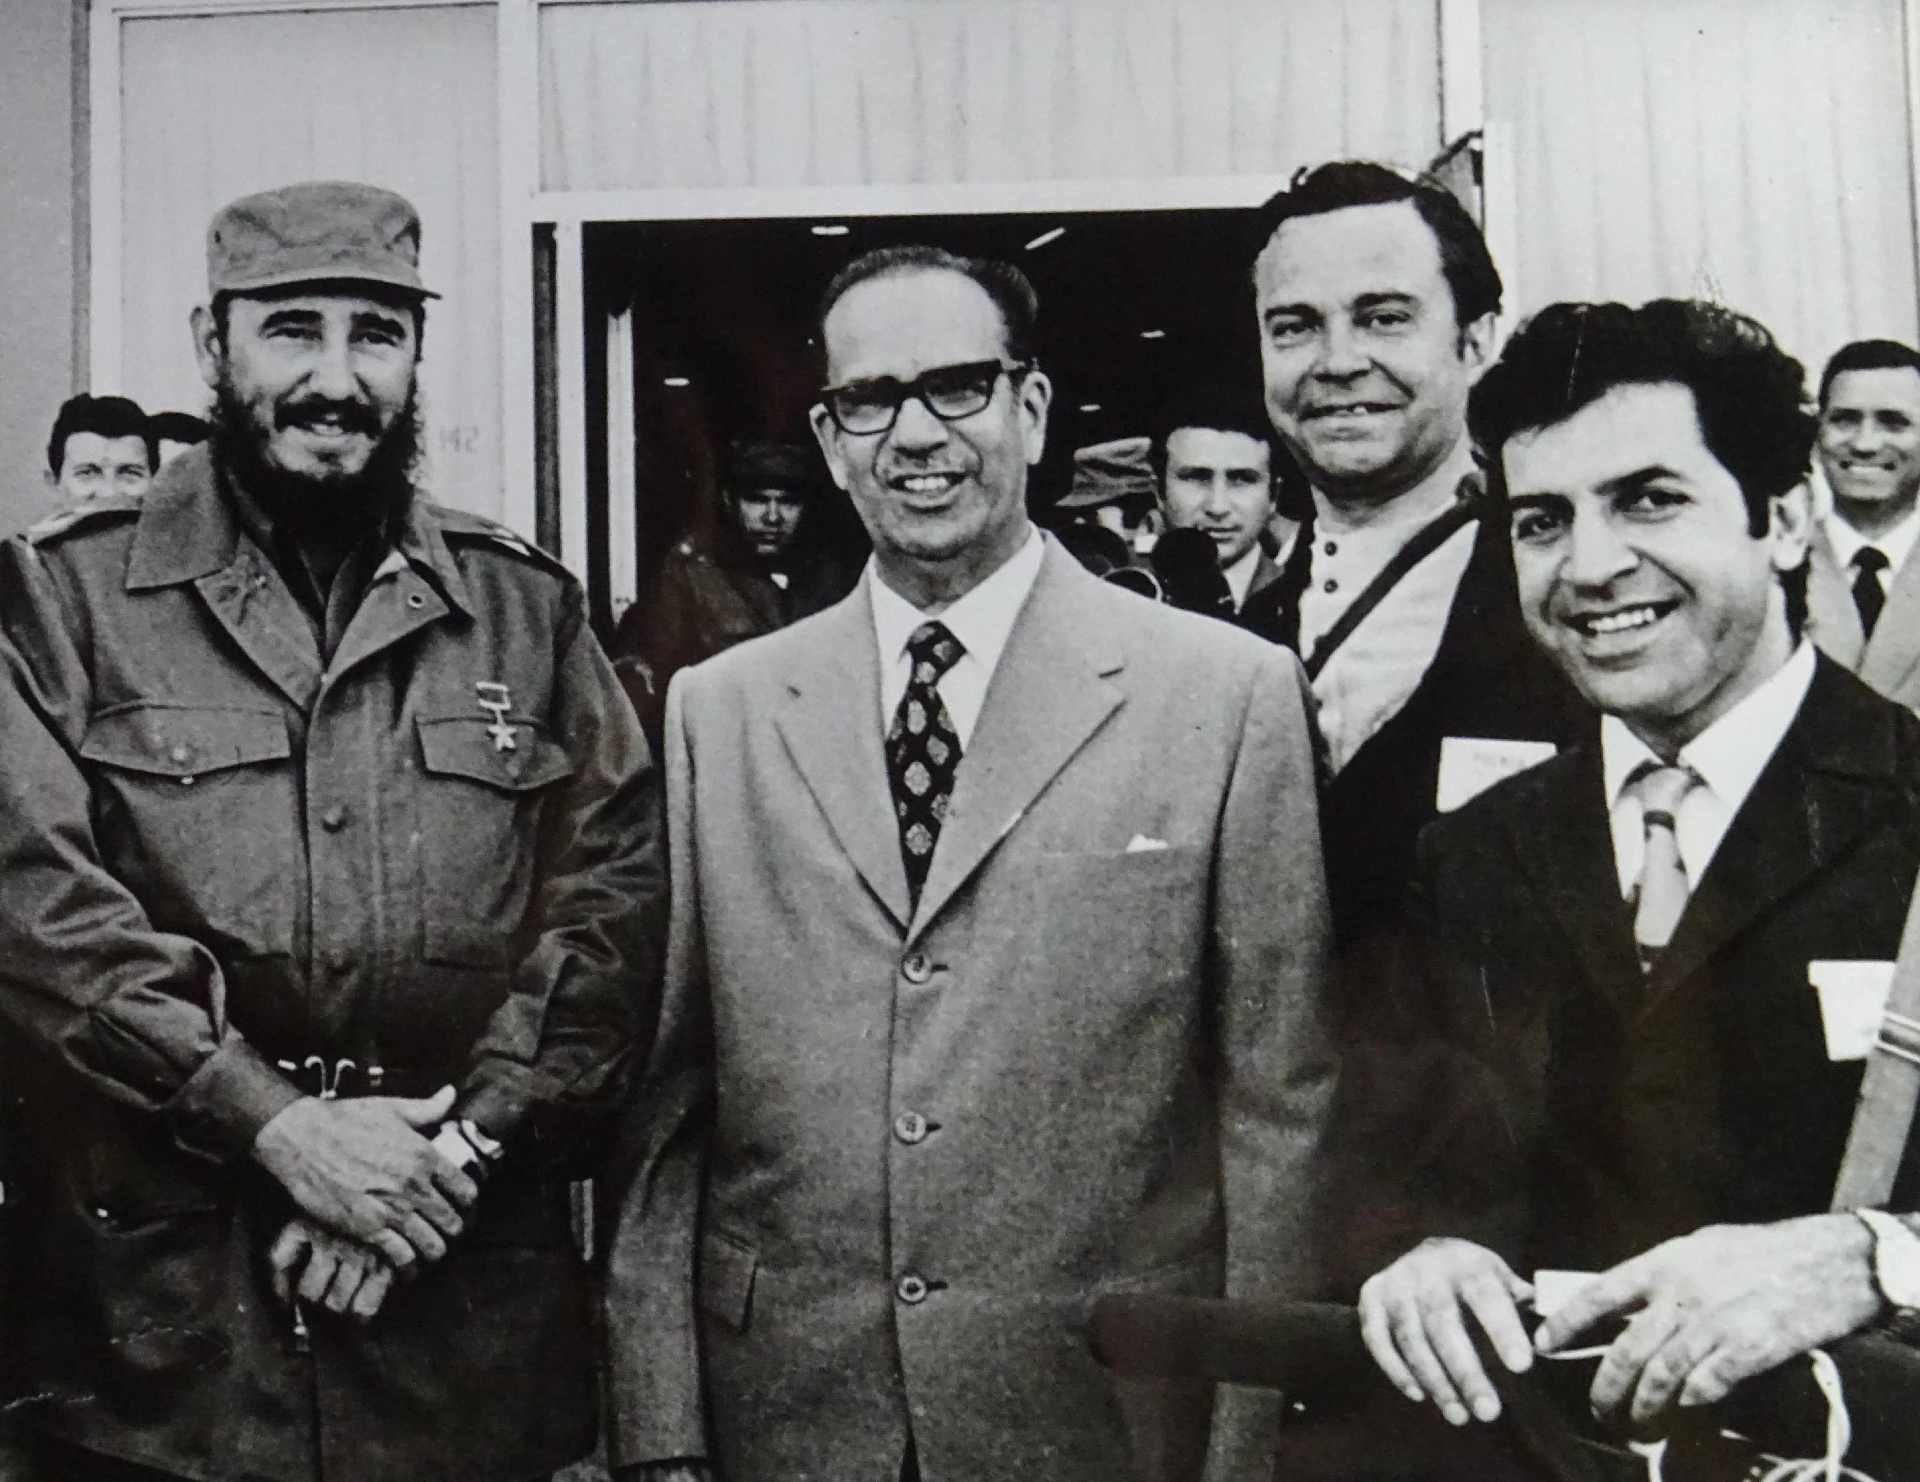 Экспонат #26. С Фиделем и Раулем Кастро. Весна 1963 года